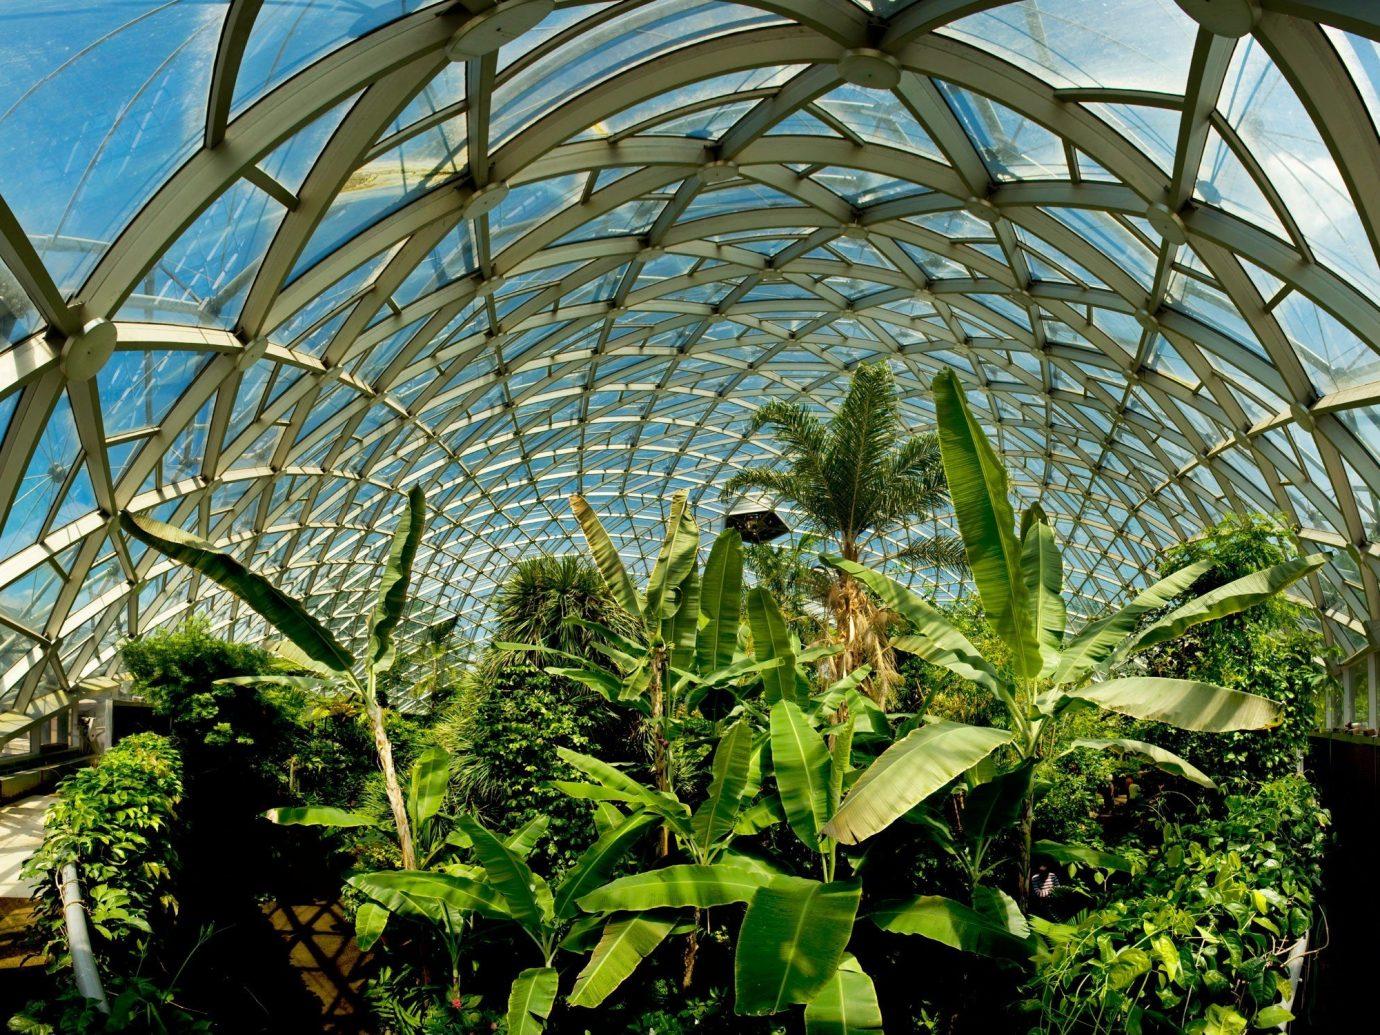 Offbeat plant Garden greenhouse botany flower arecales outdoor structure tropics Jungle botanical garden